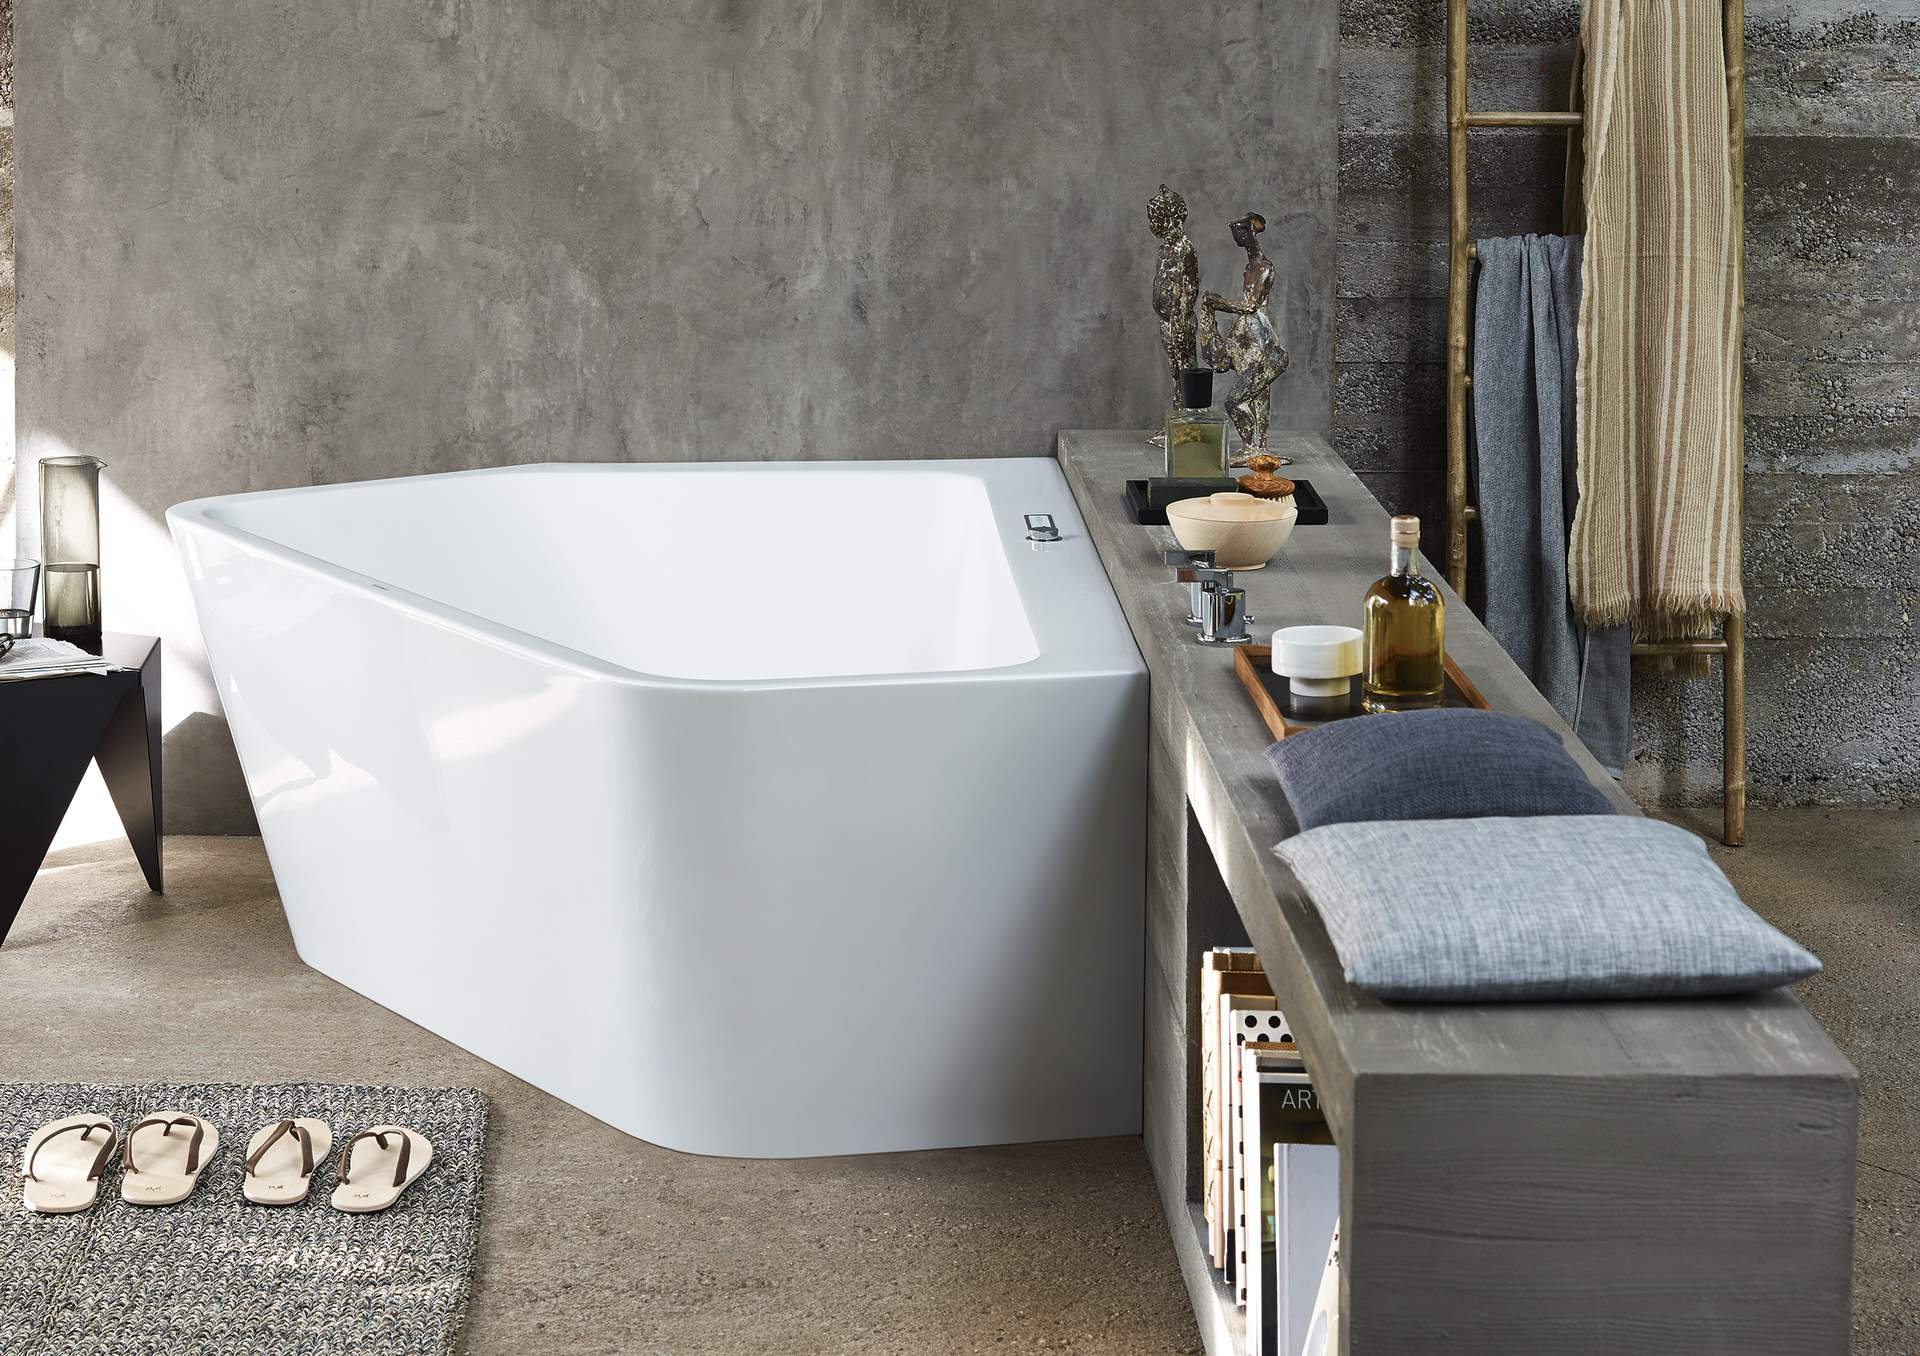 Duravit Paiova 5: Newest addition to the bathtub family | Duravit